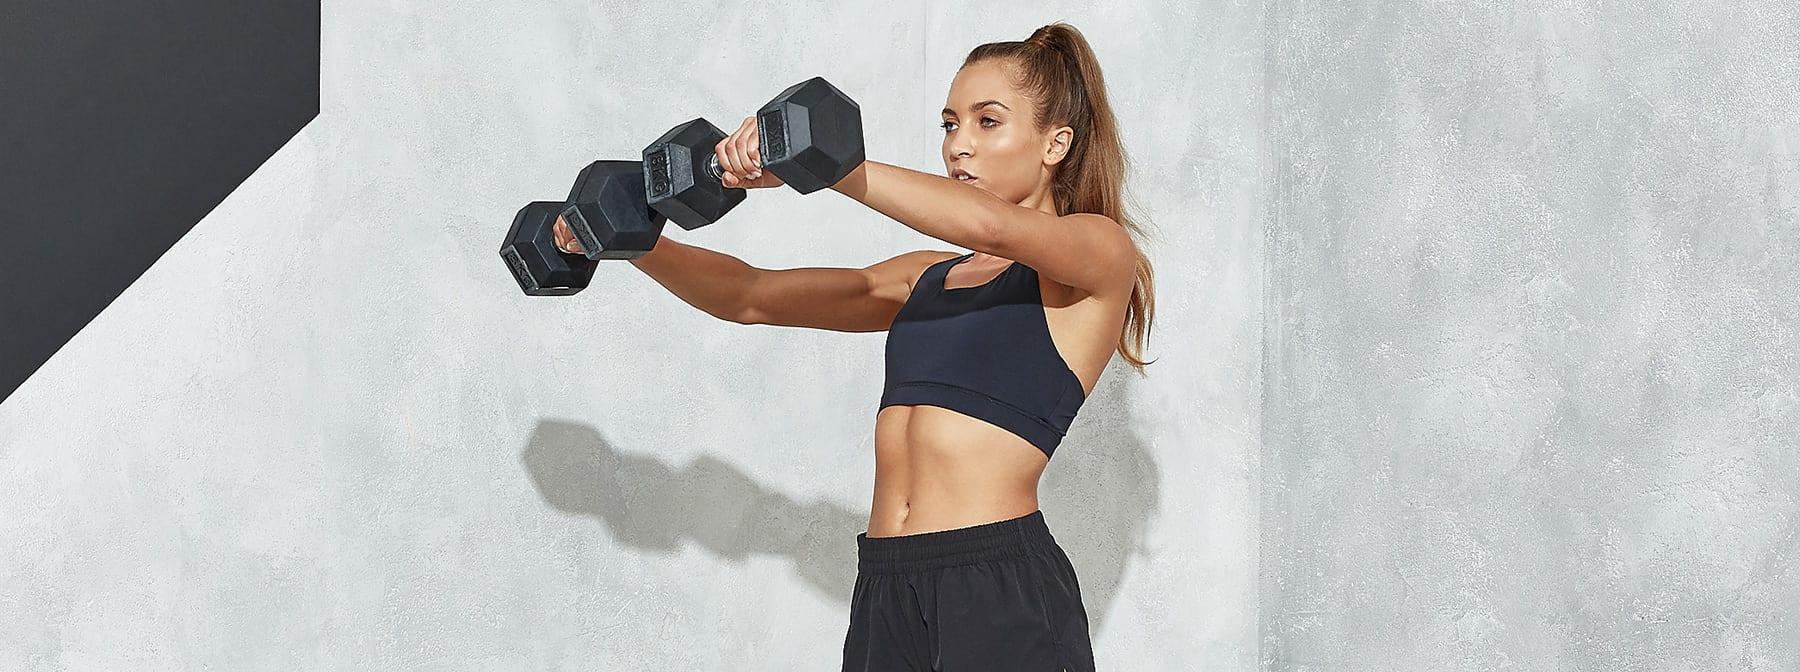 dieta k d hills 31 lb pierdere în greutate